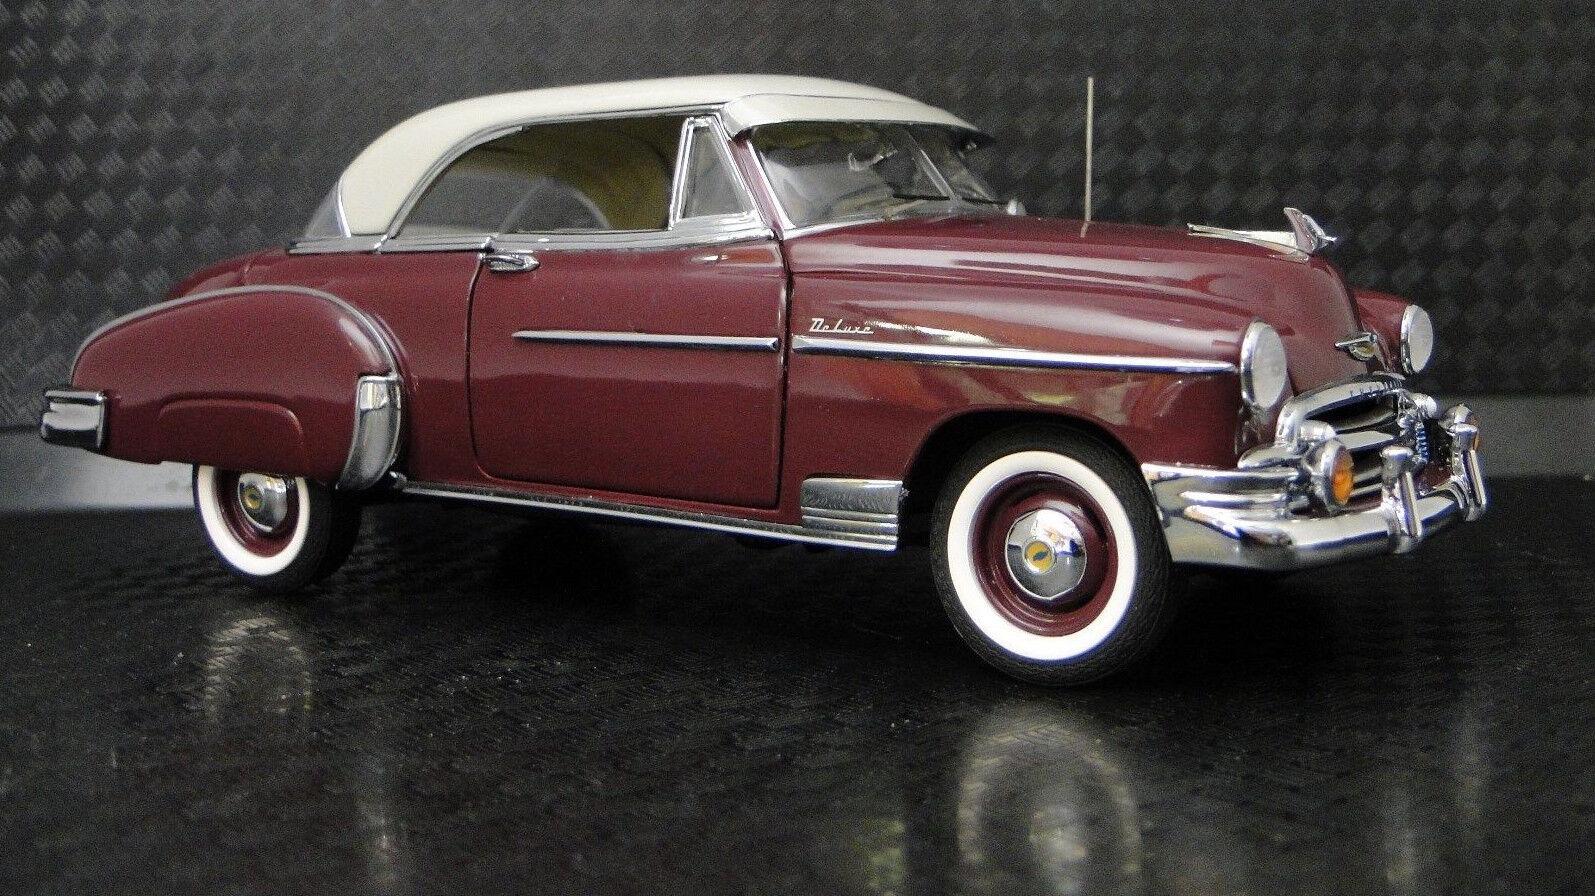 1950s Chevy Bel Air coche 1 Belair 64 Chevrolet 43 Vintage 24 Metal 18 Modelo 12